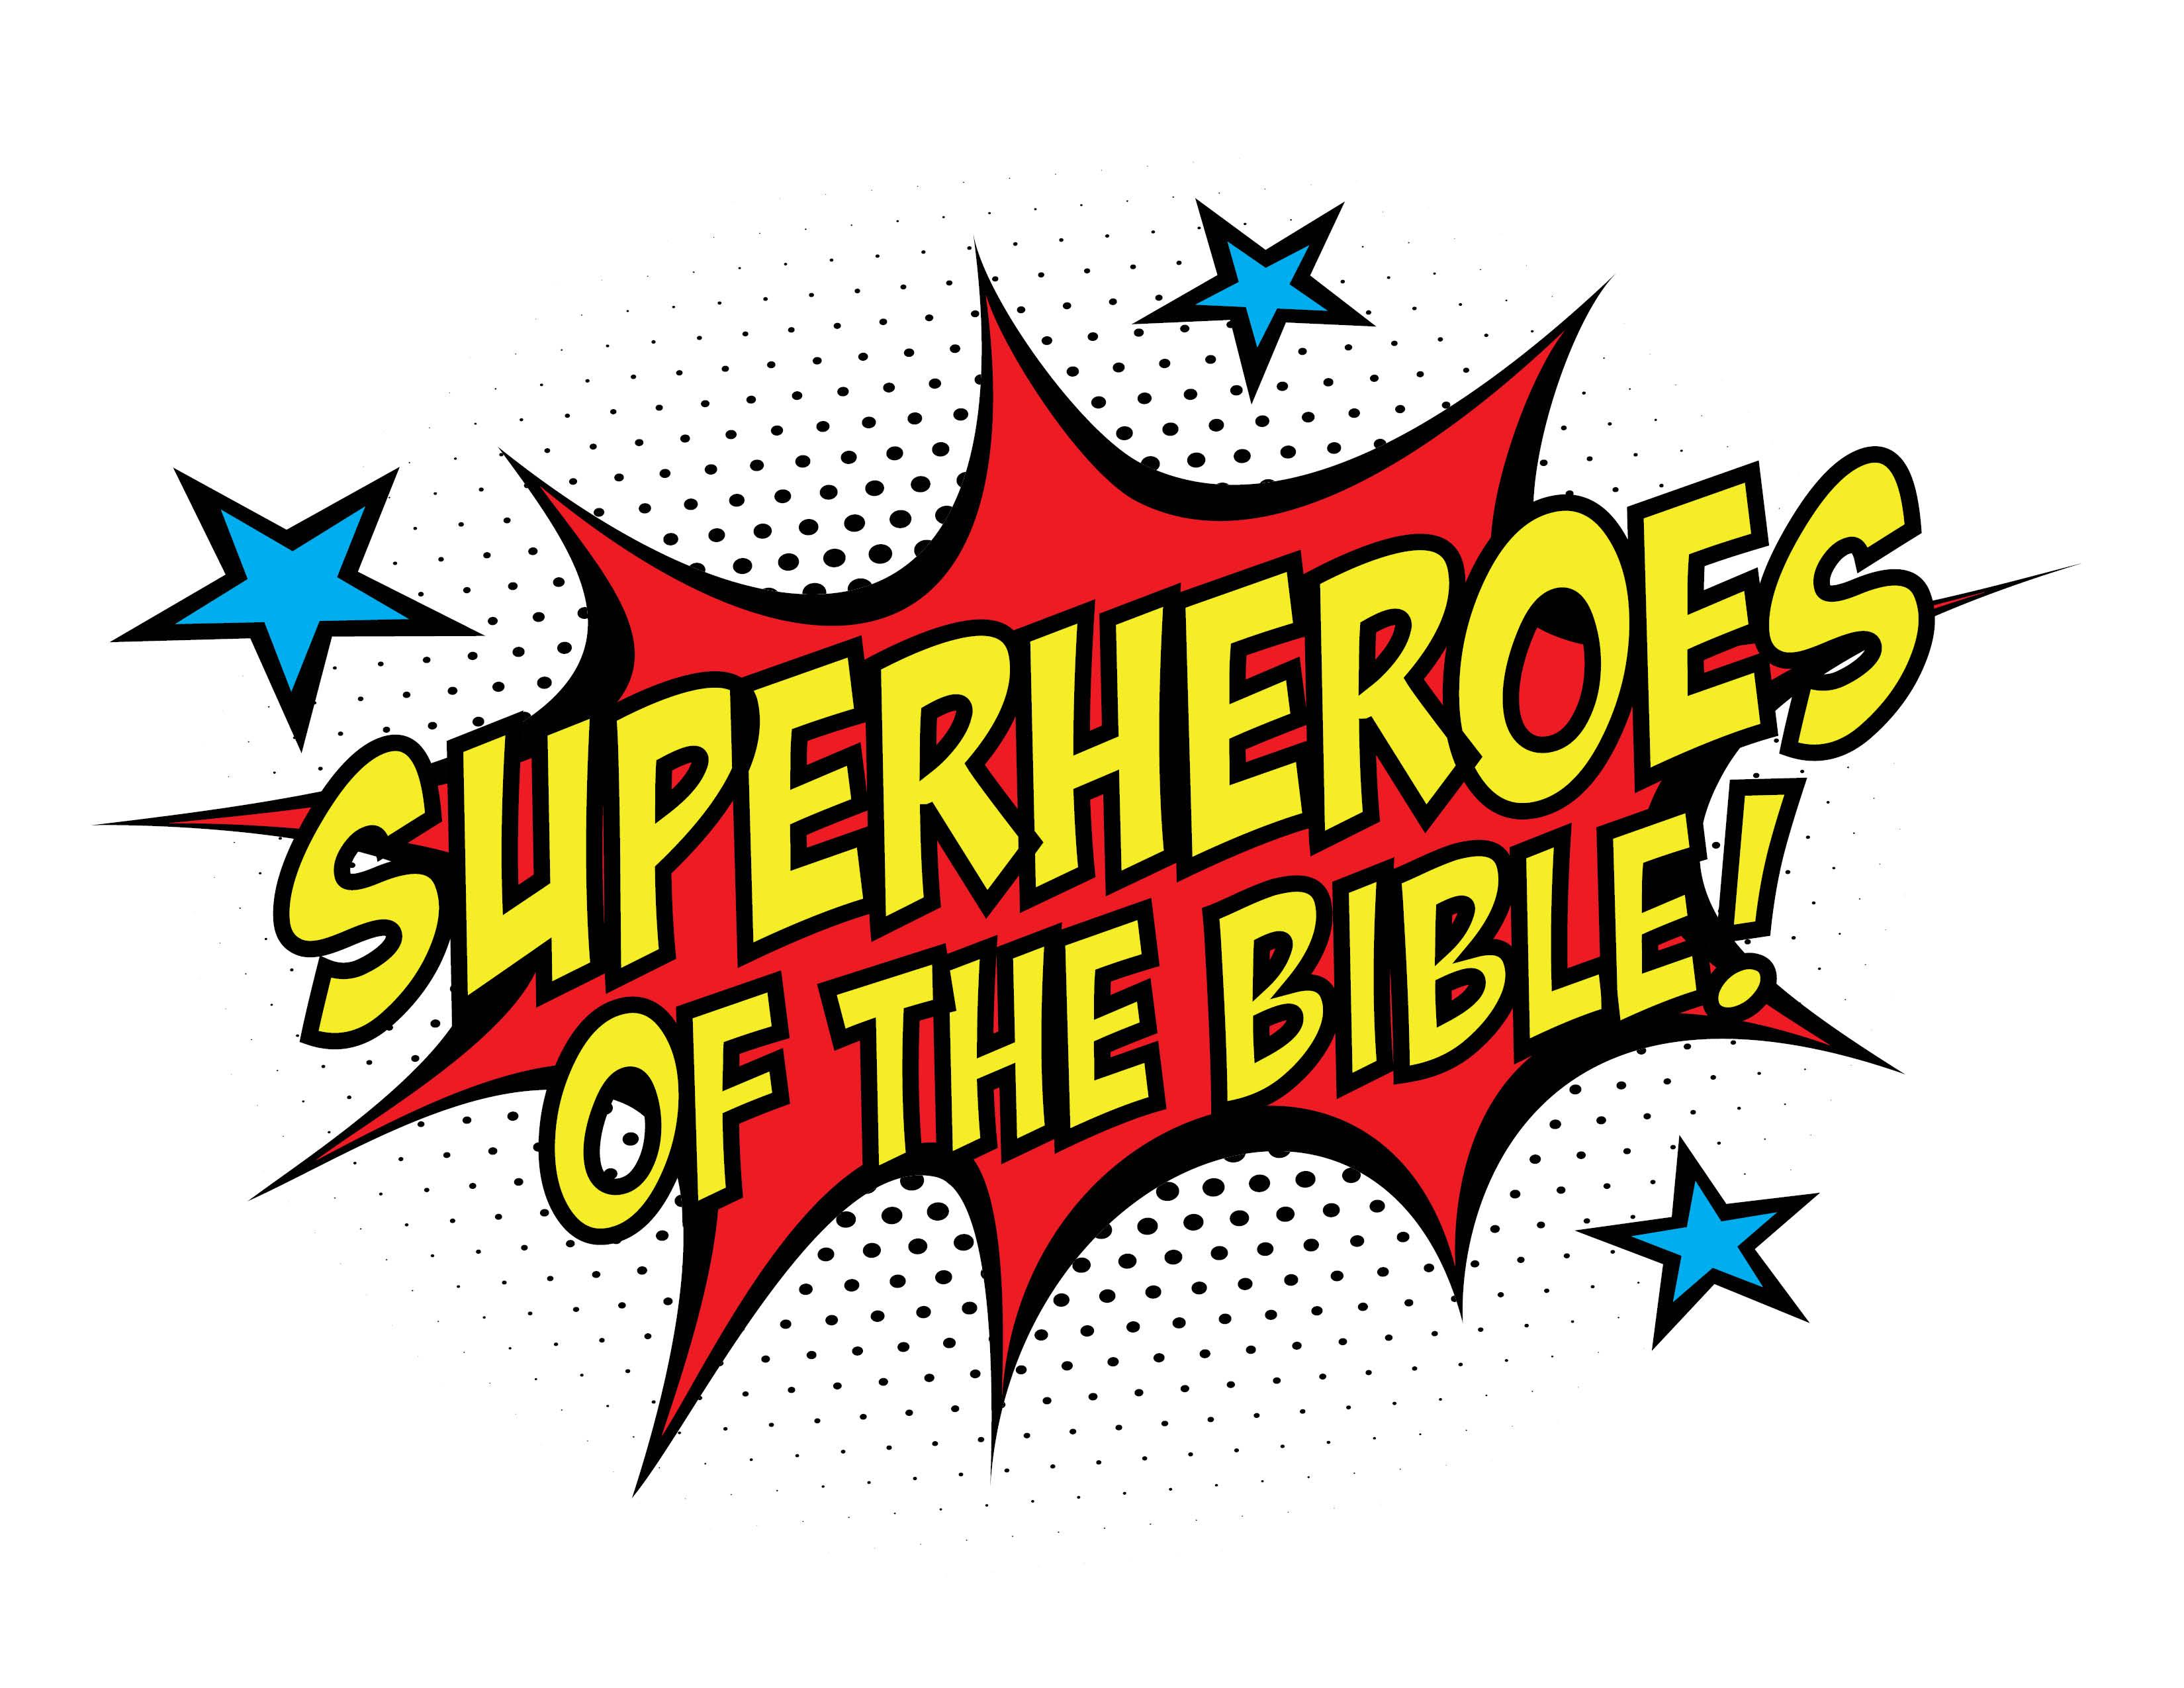 Vbs superheroes of the. Clipart bible superhero